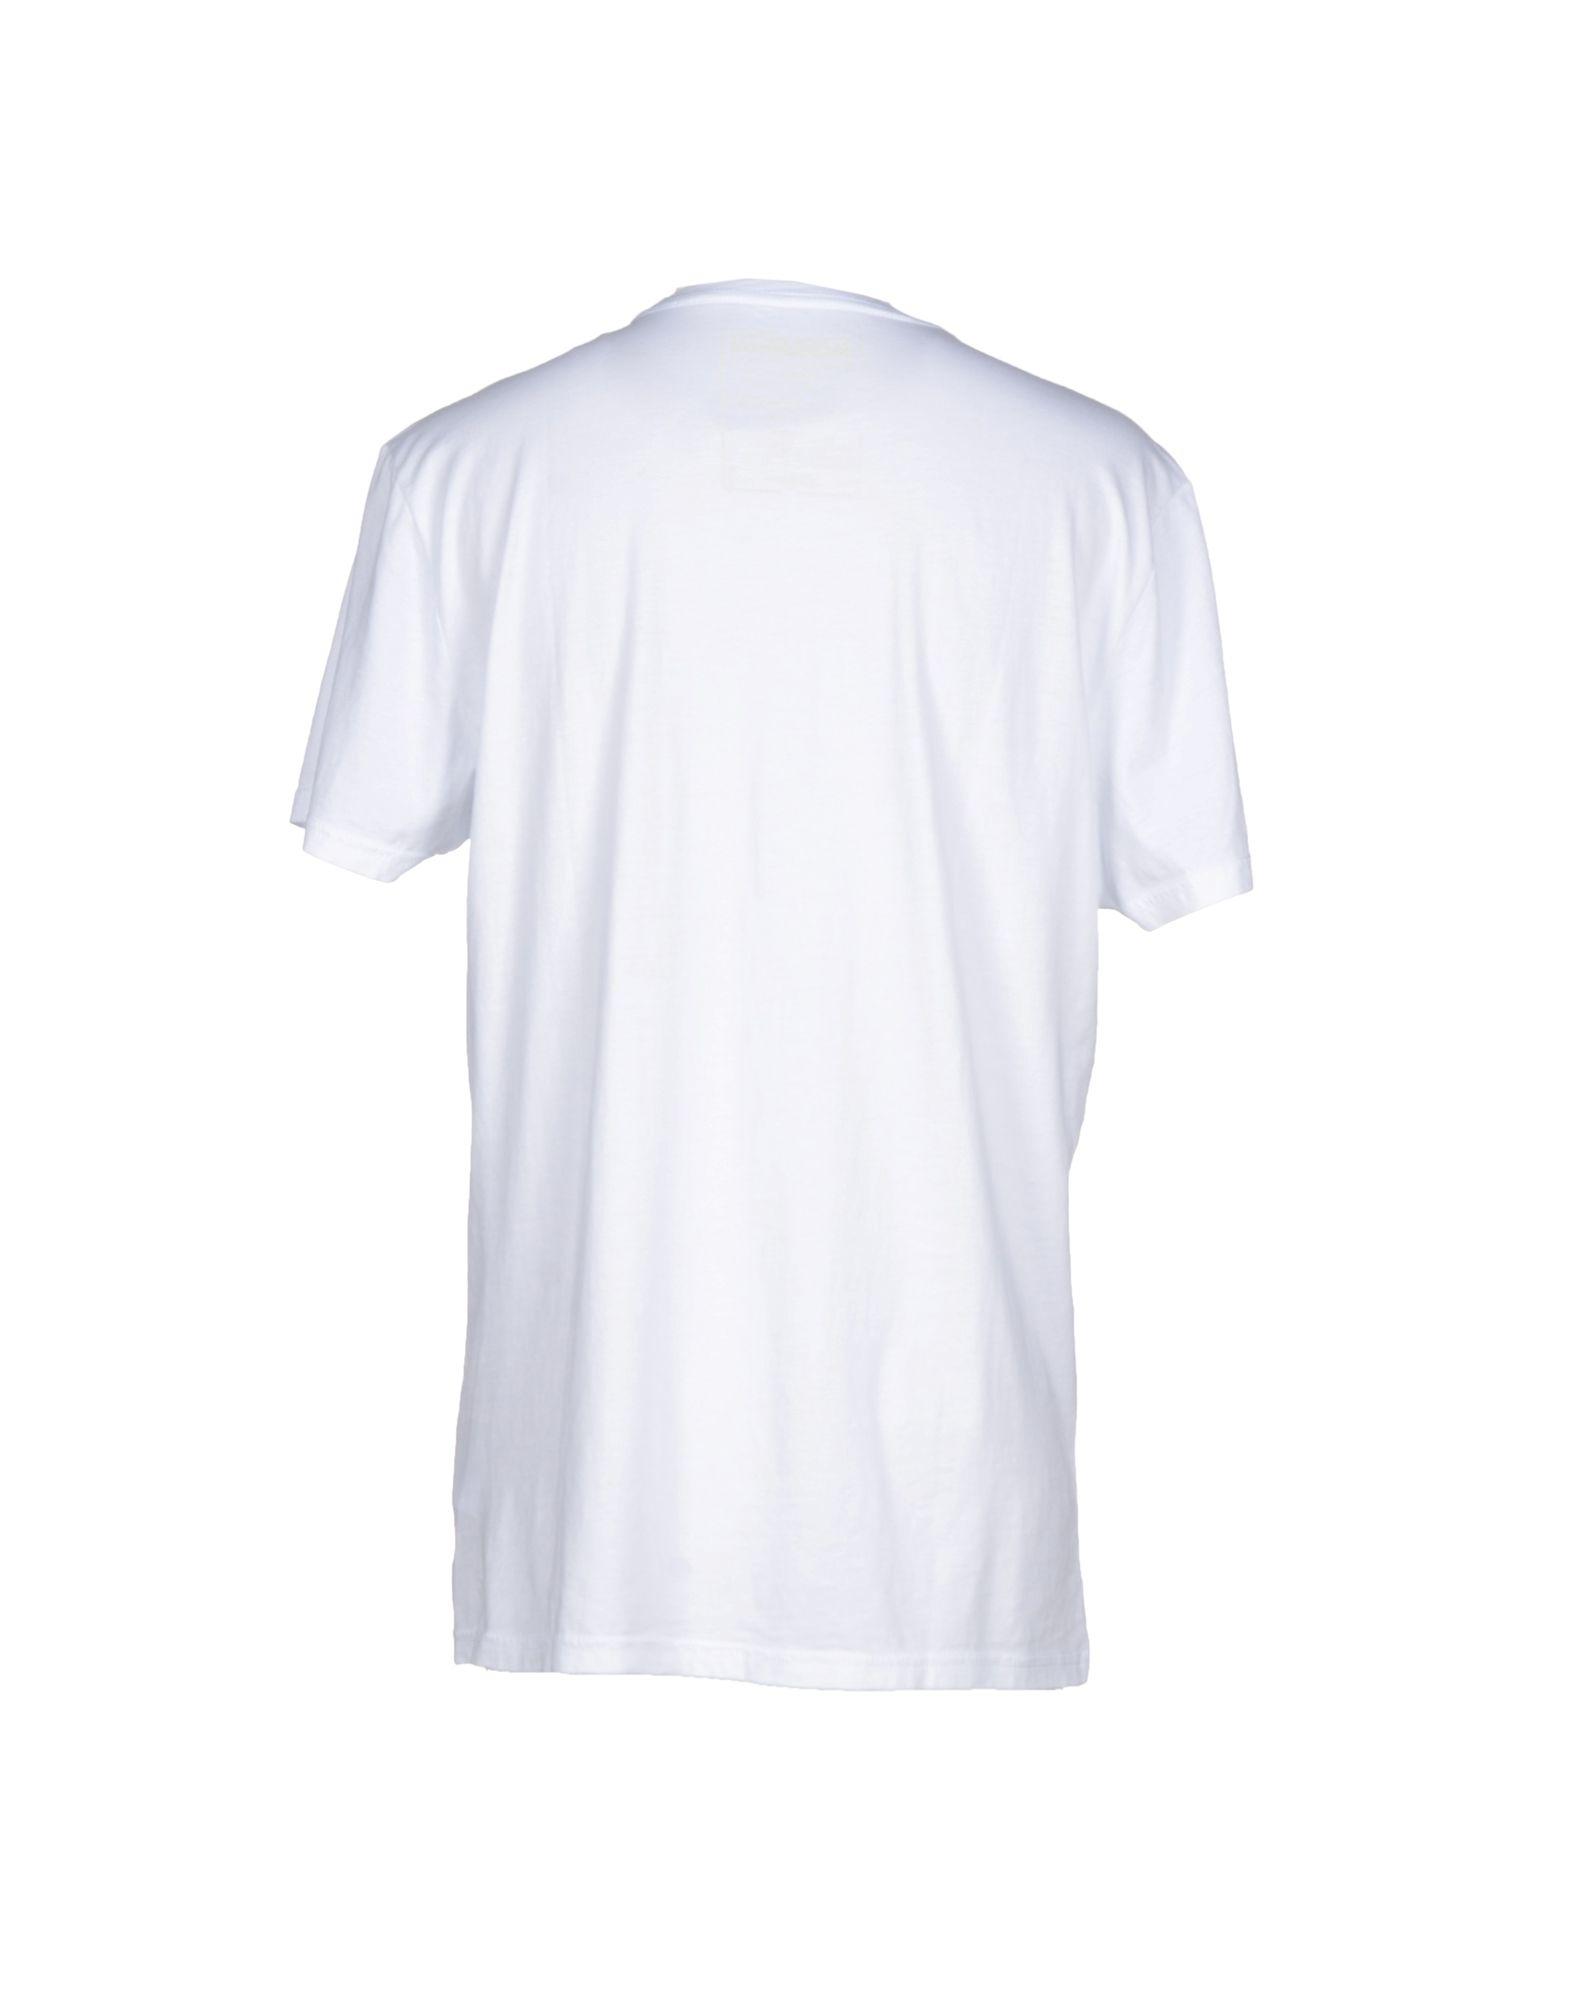 lyst napapijri t shirt in white for men. Black Bedroom Furniture Sets. Home Design Ideas